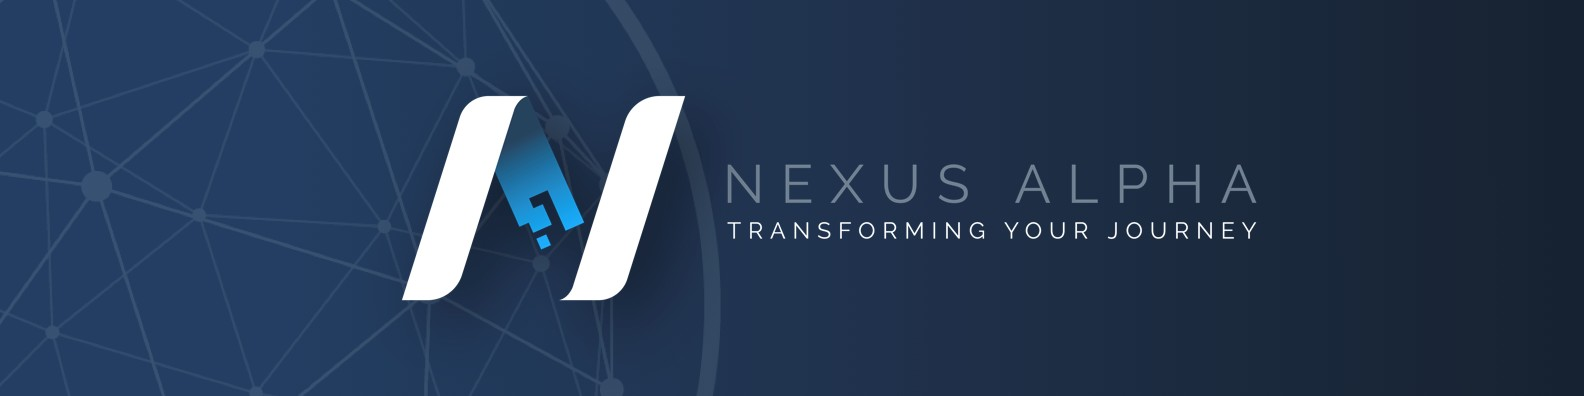 Nexus Alpha Limited | LinkedIn